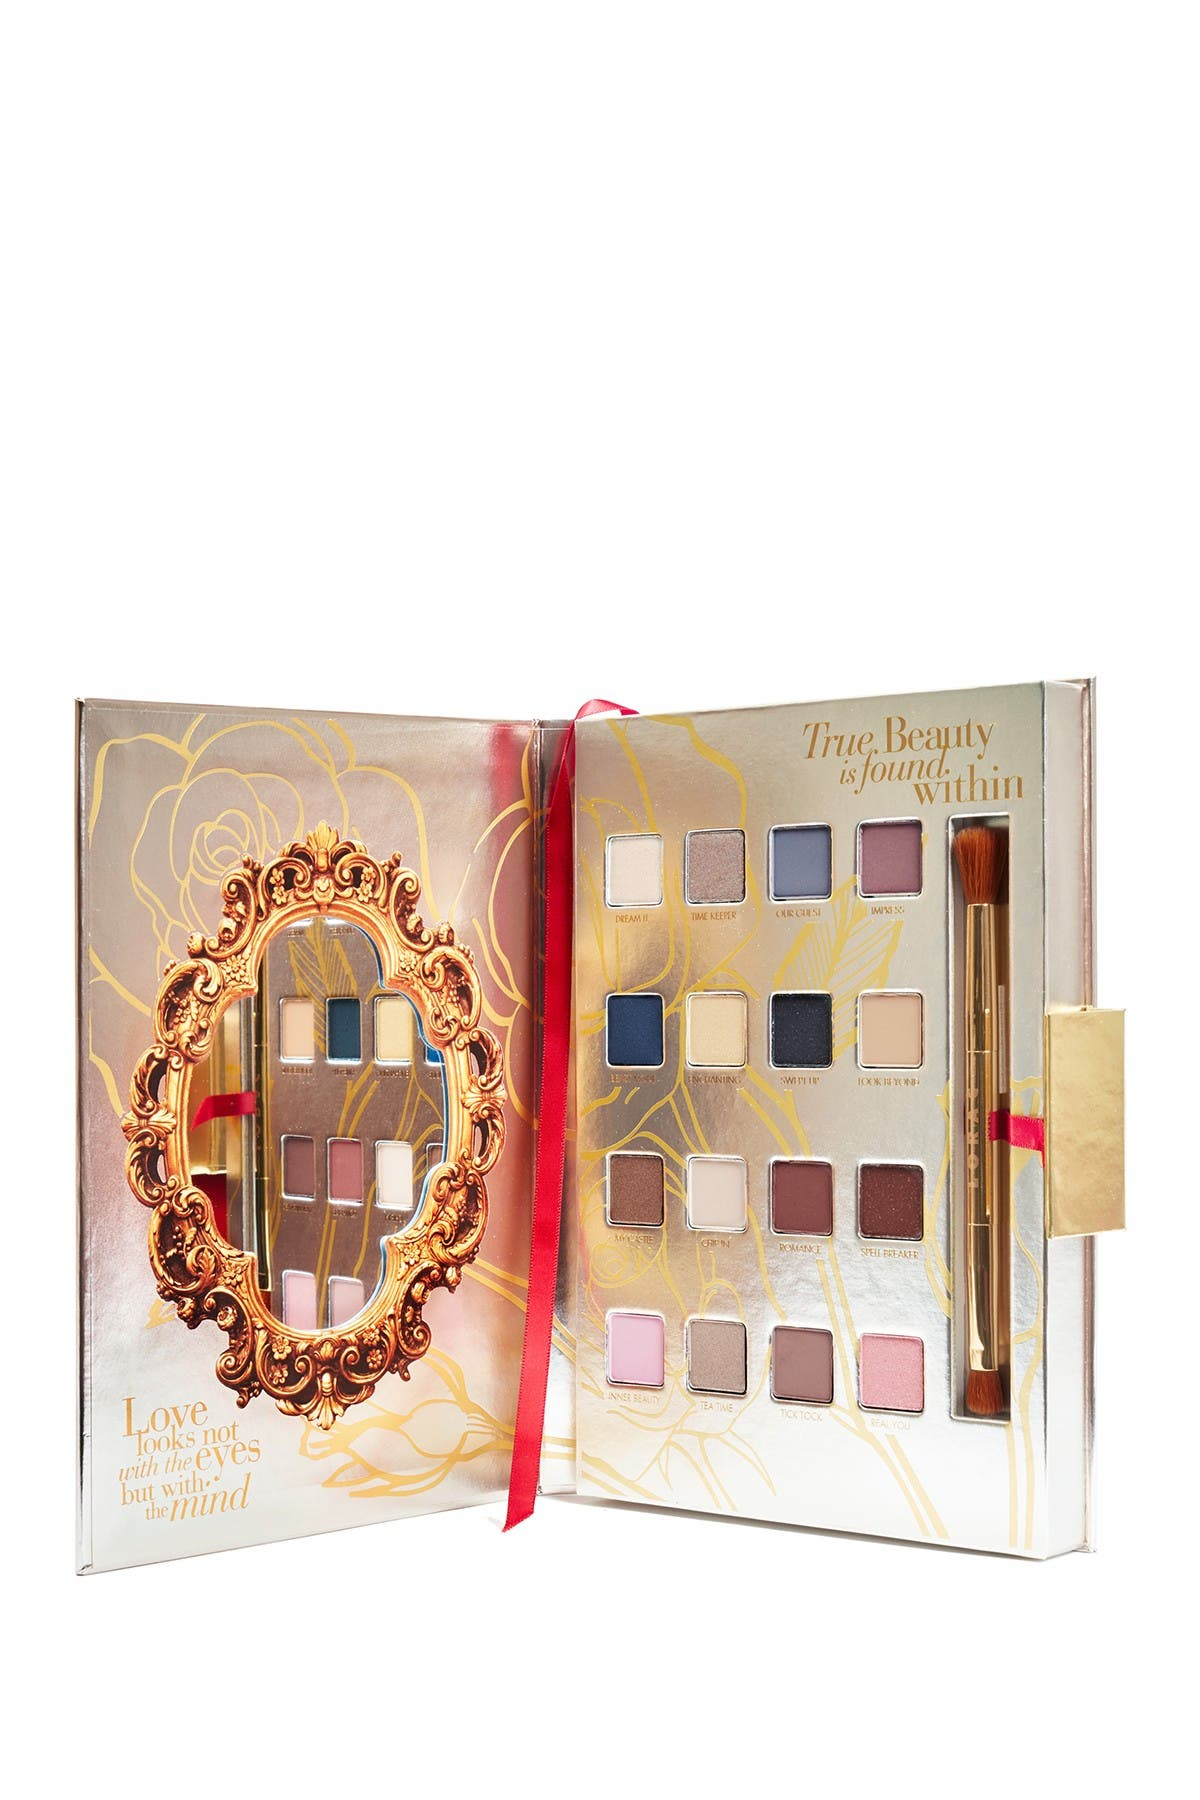 Image of LORAC Beauty & The Beast Eyeshadow Palette